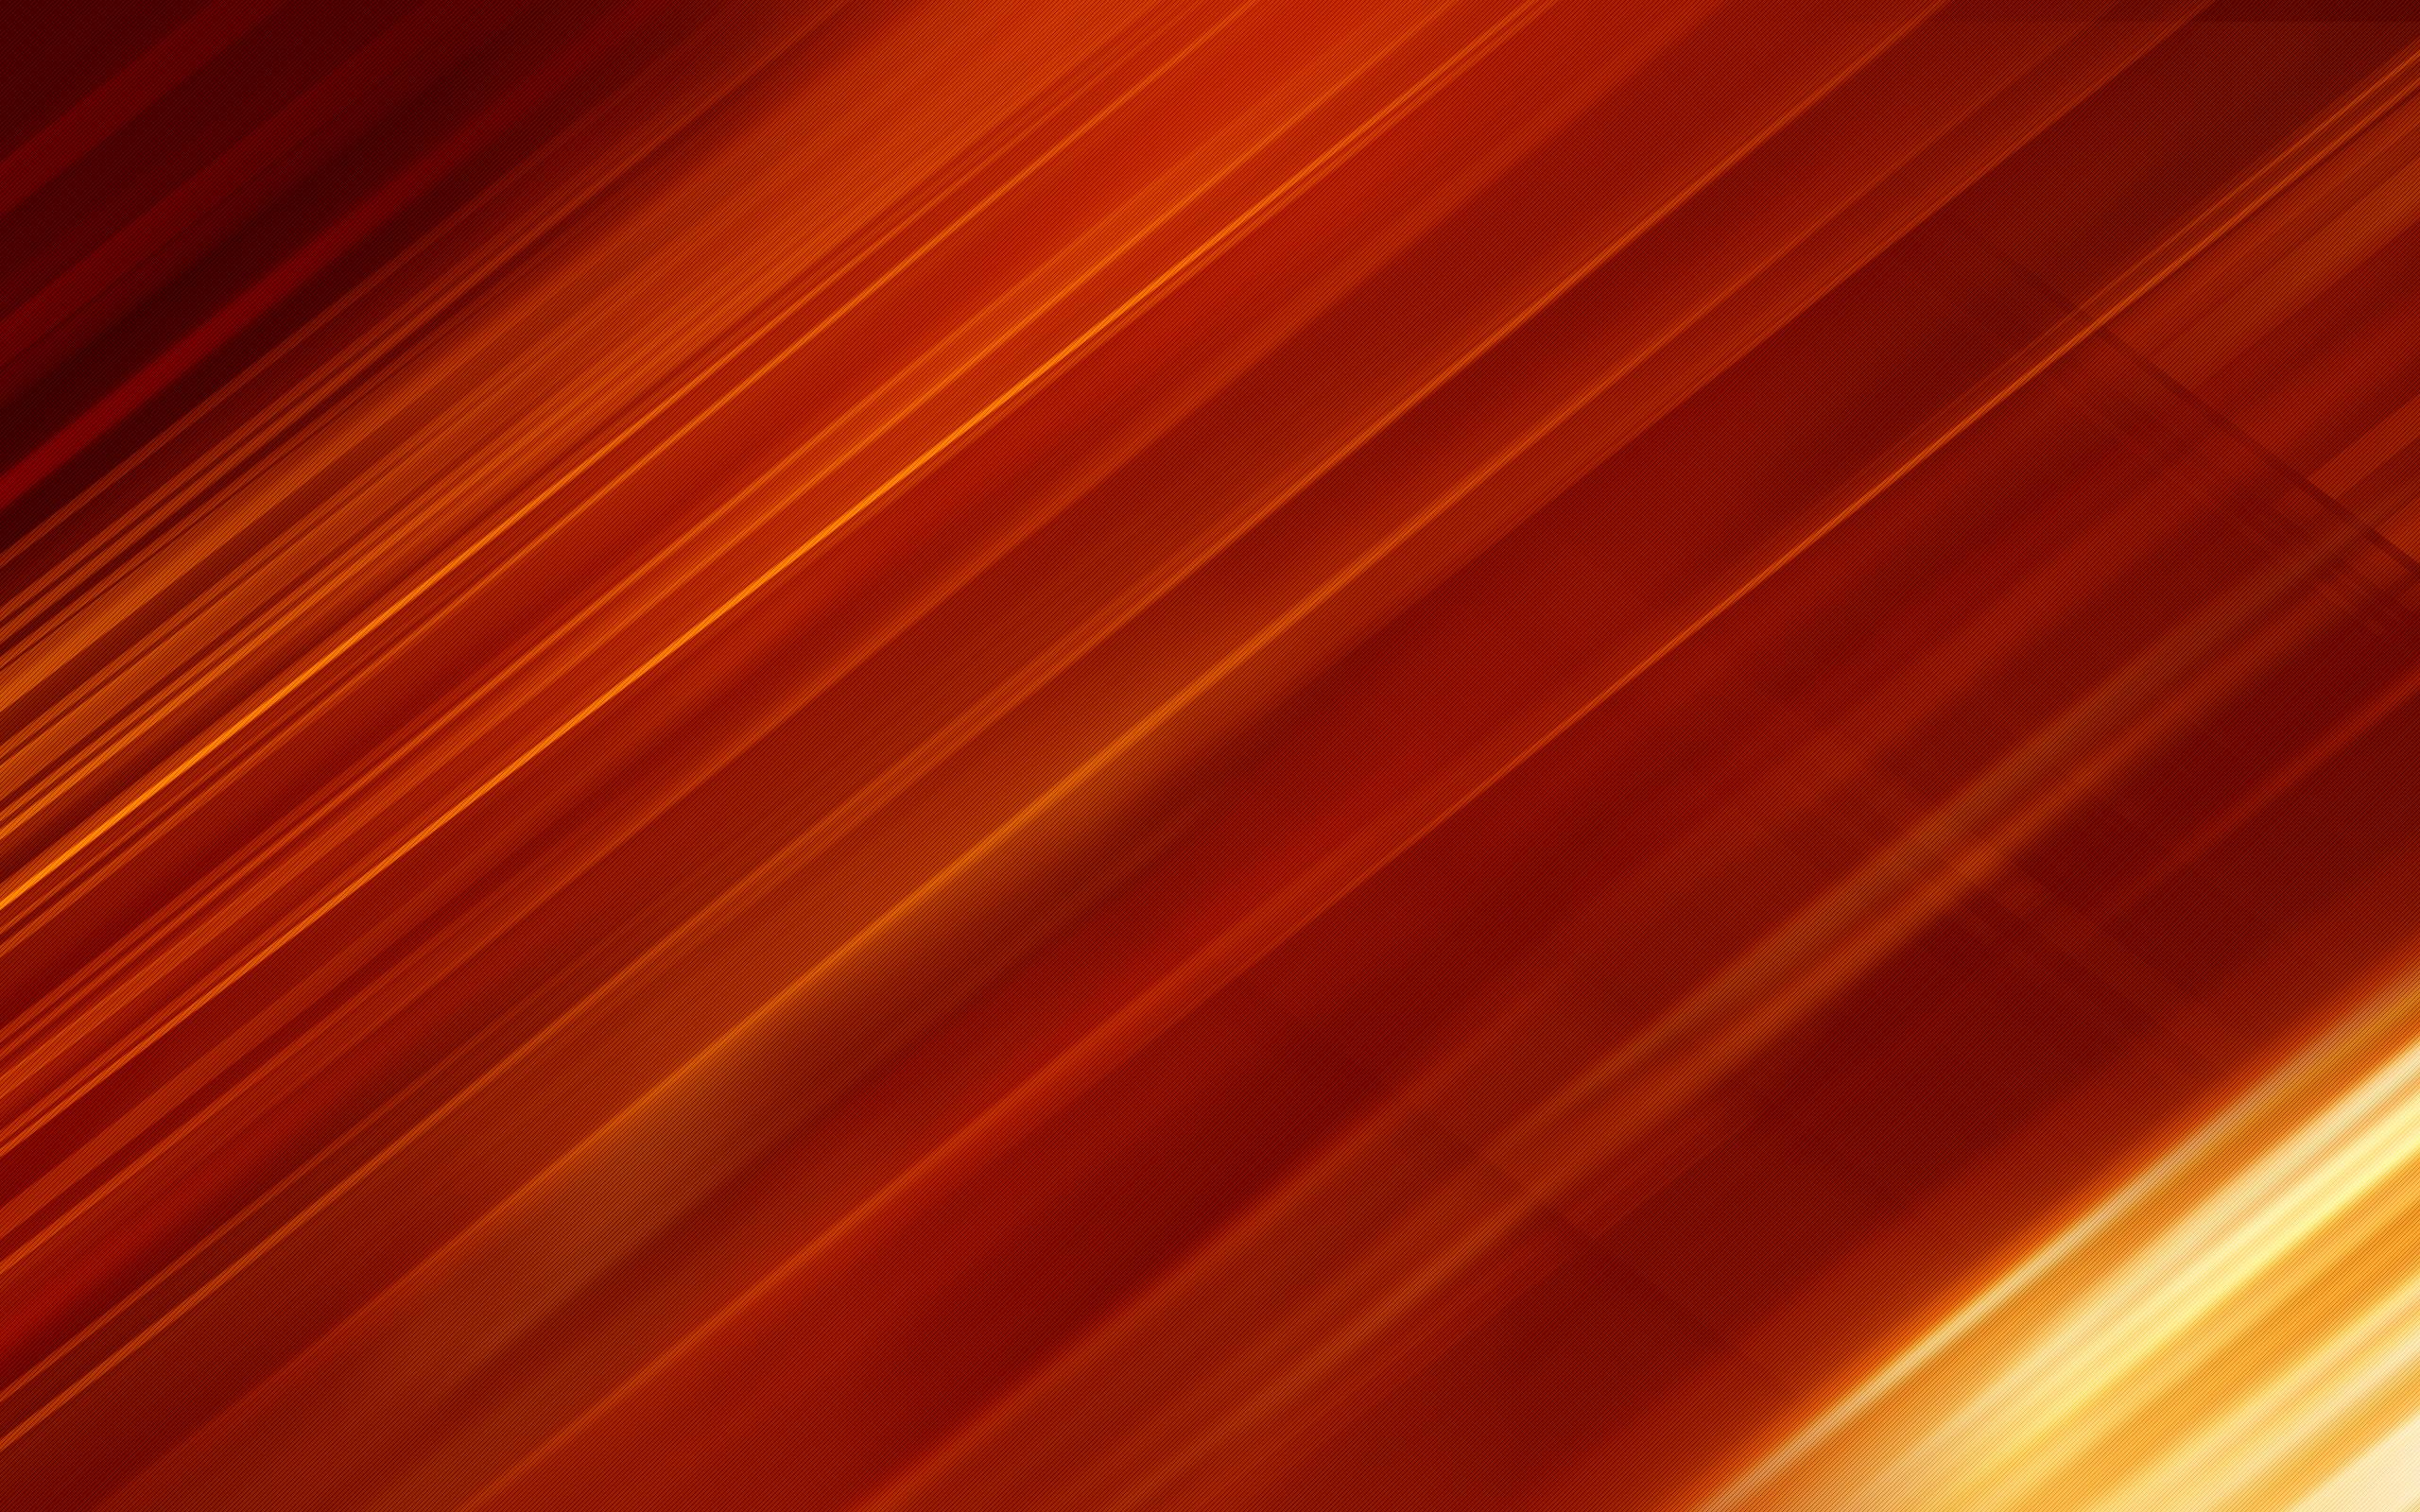 wallpaper red gold seamless red gold swirls wallpaper royalty